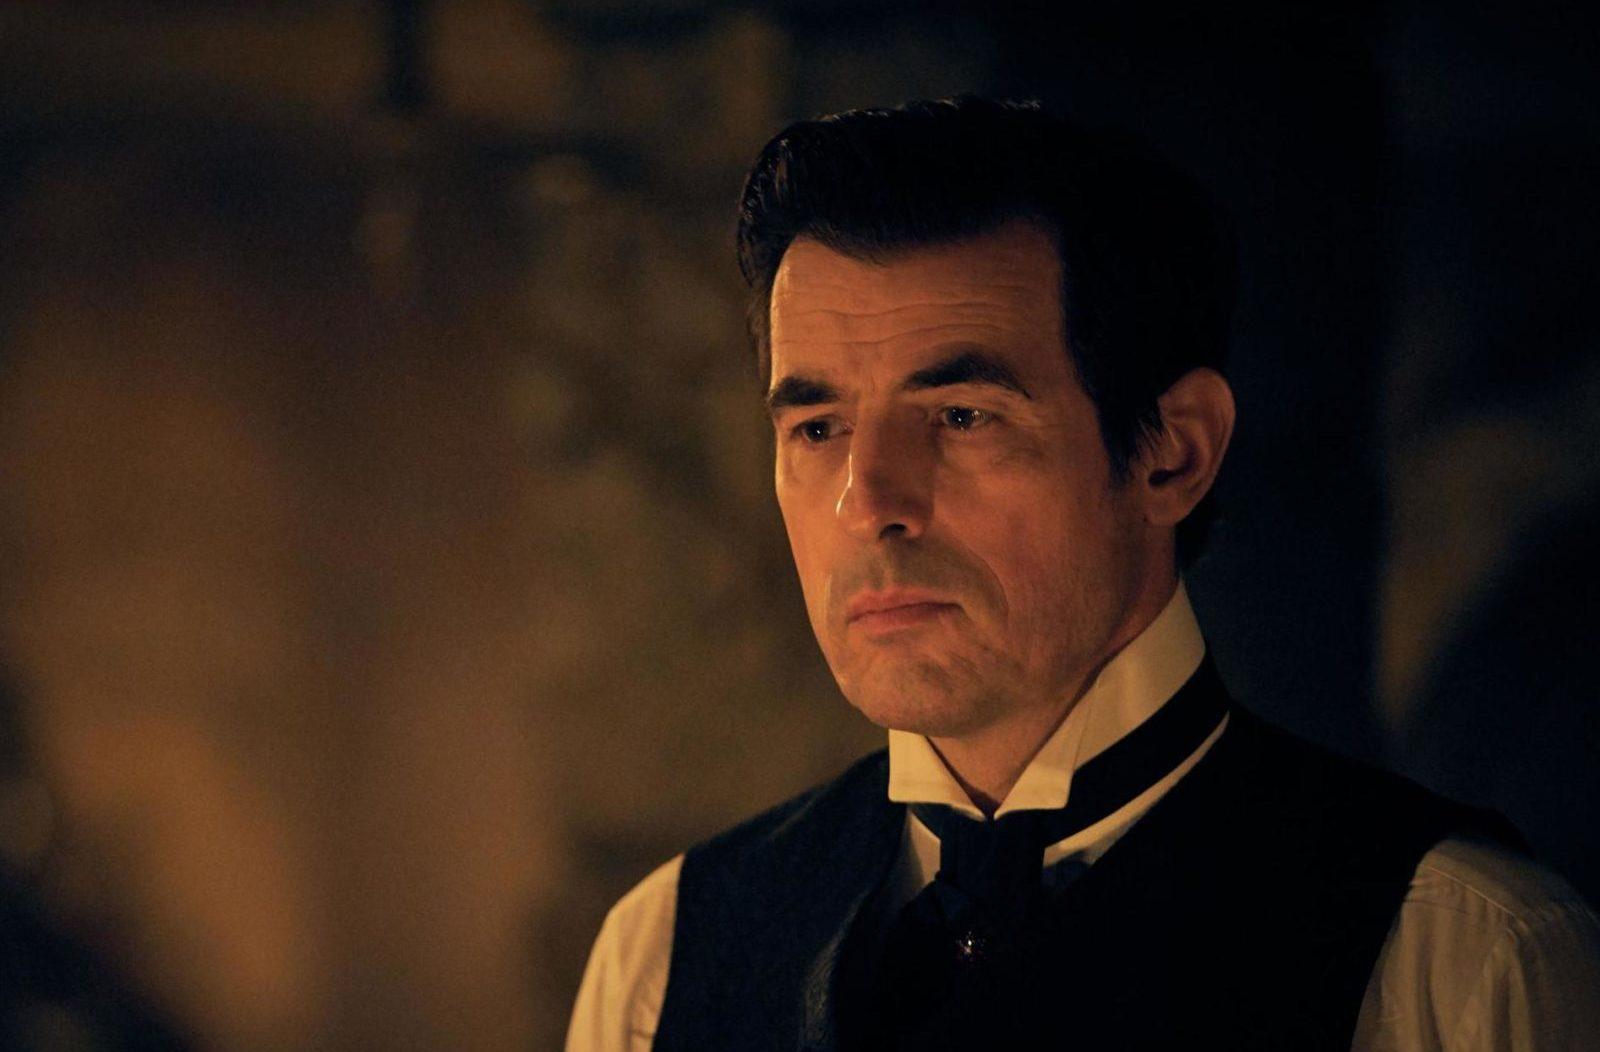 La miniserie Drácula anuncia fecha de estreno en BBC